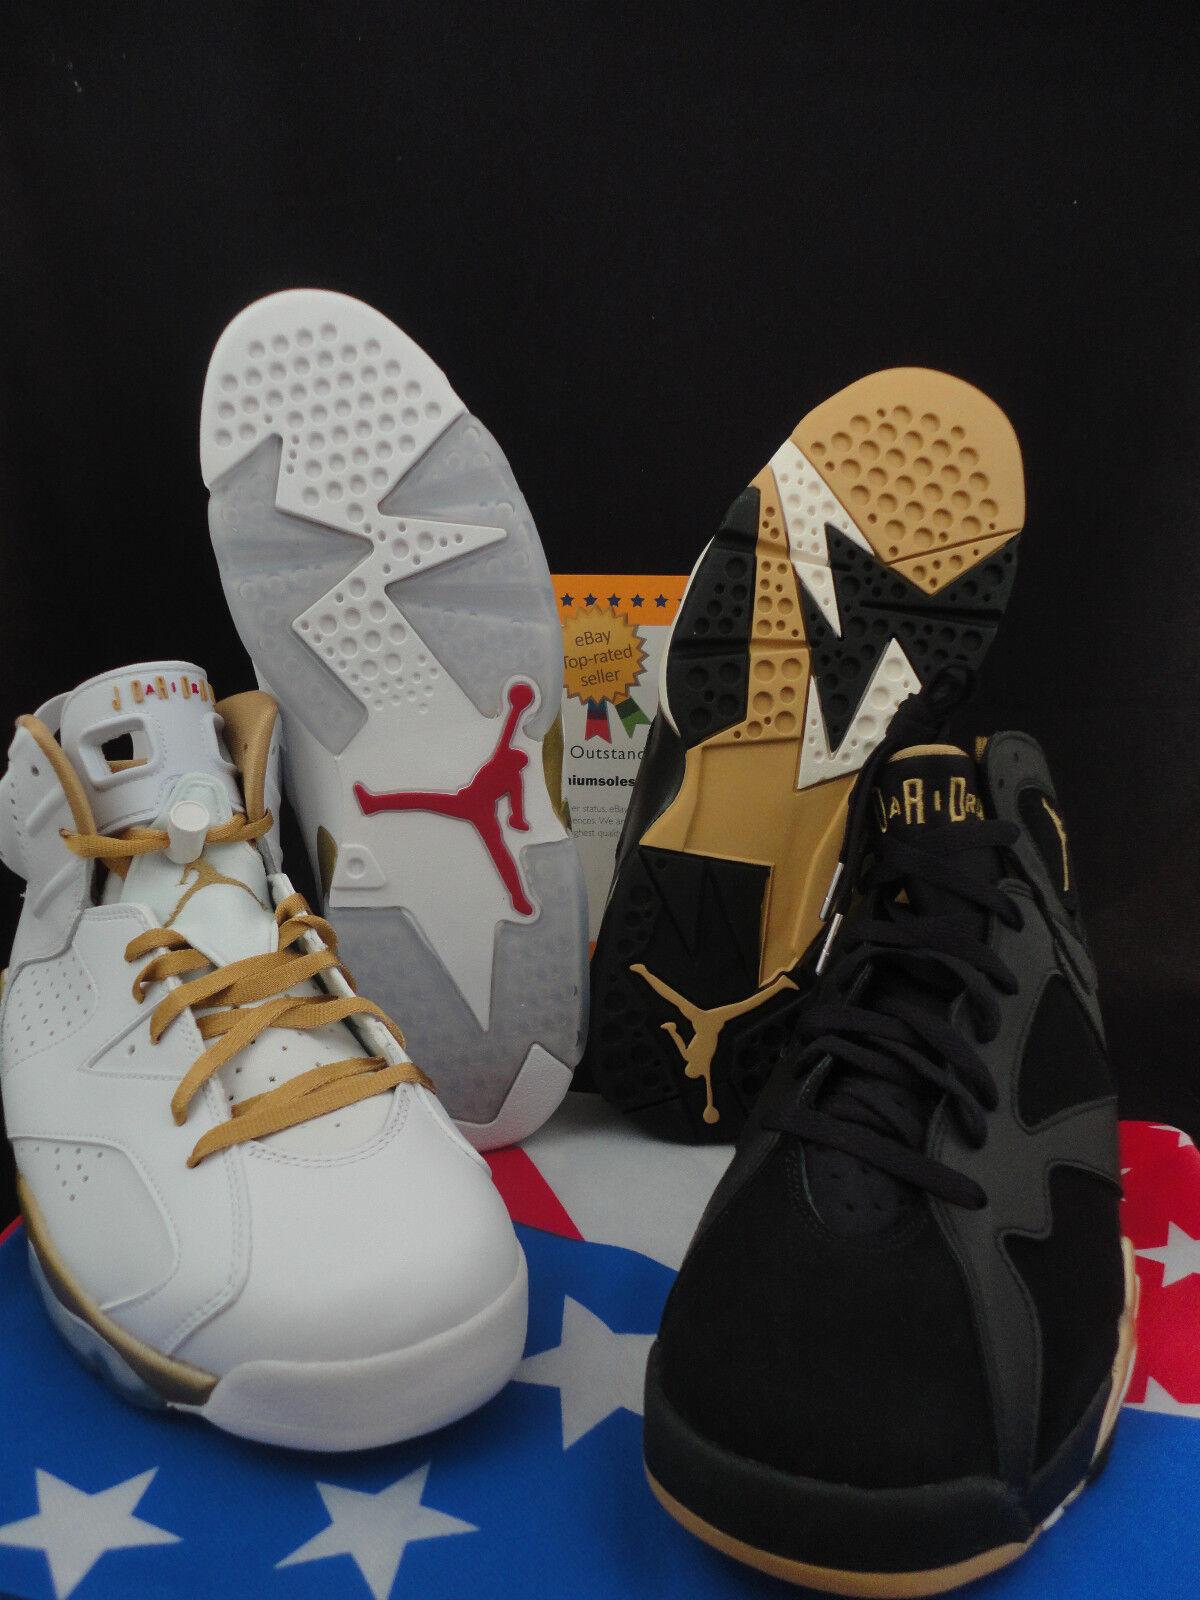 Nike Air Jordan Golden Moment Pack, Size 11.5, Olympics, GMP, Retro 6, Retro 7